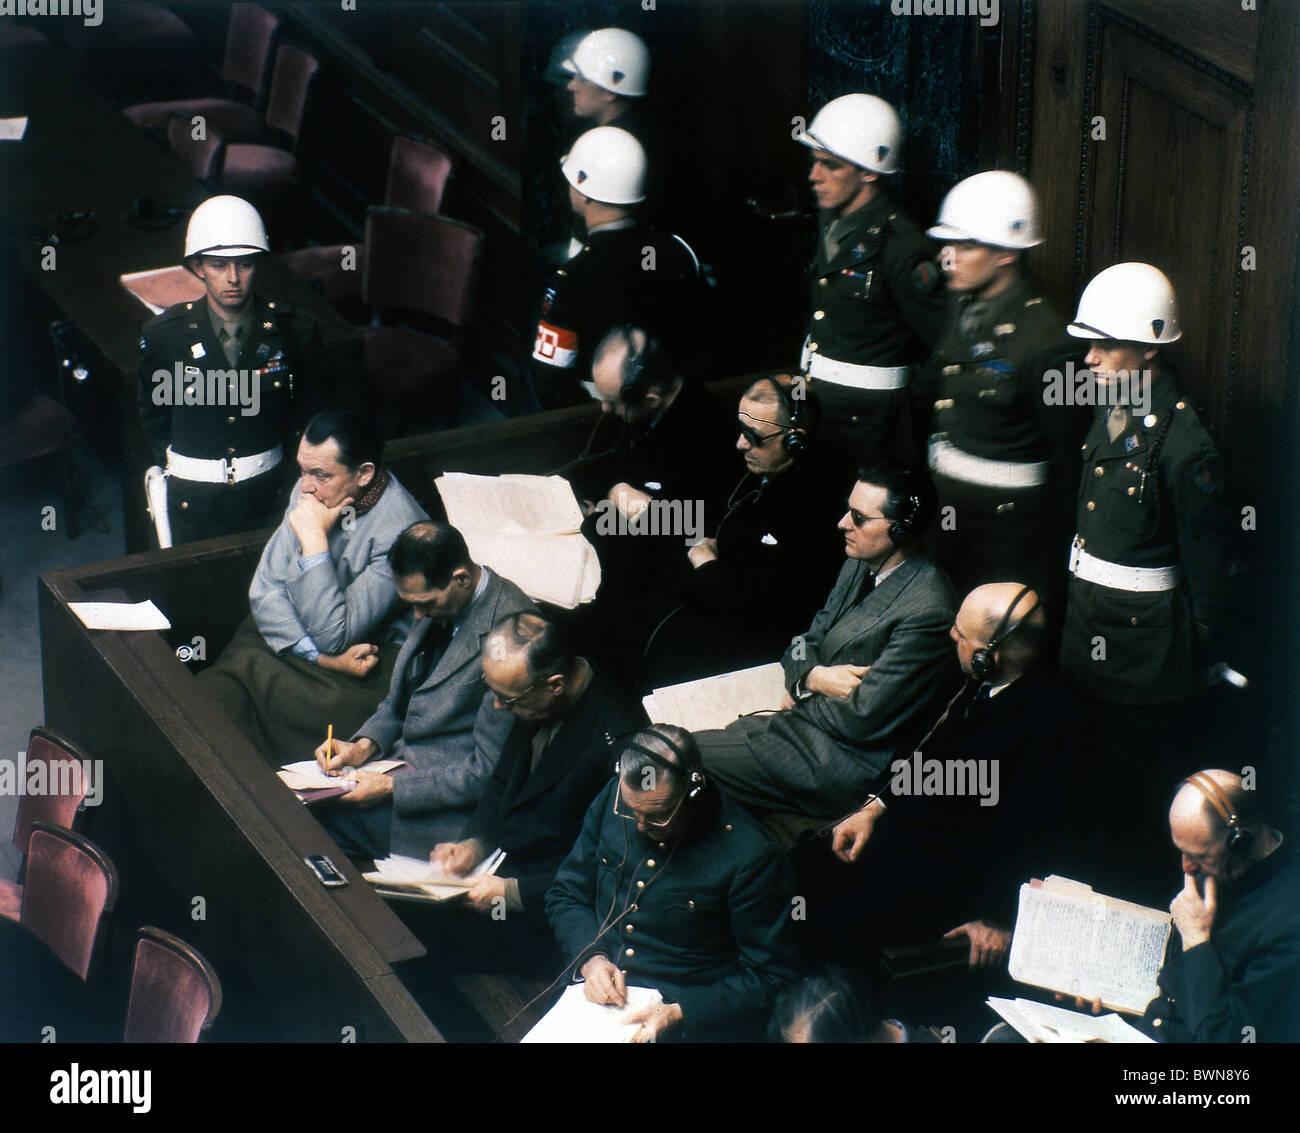 Nuremberg 1946 International Military Tribunal October 1 Court House Room 600 defendants International War Crim - Stock Image